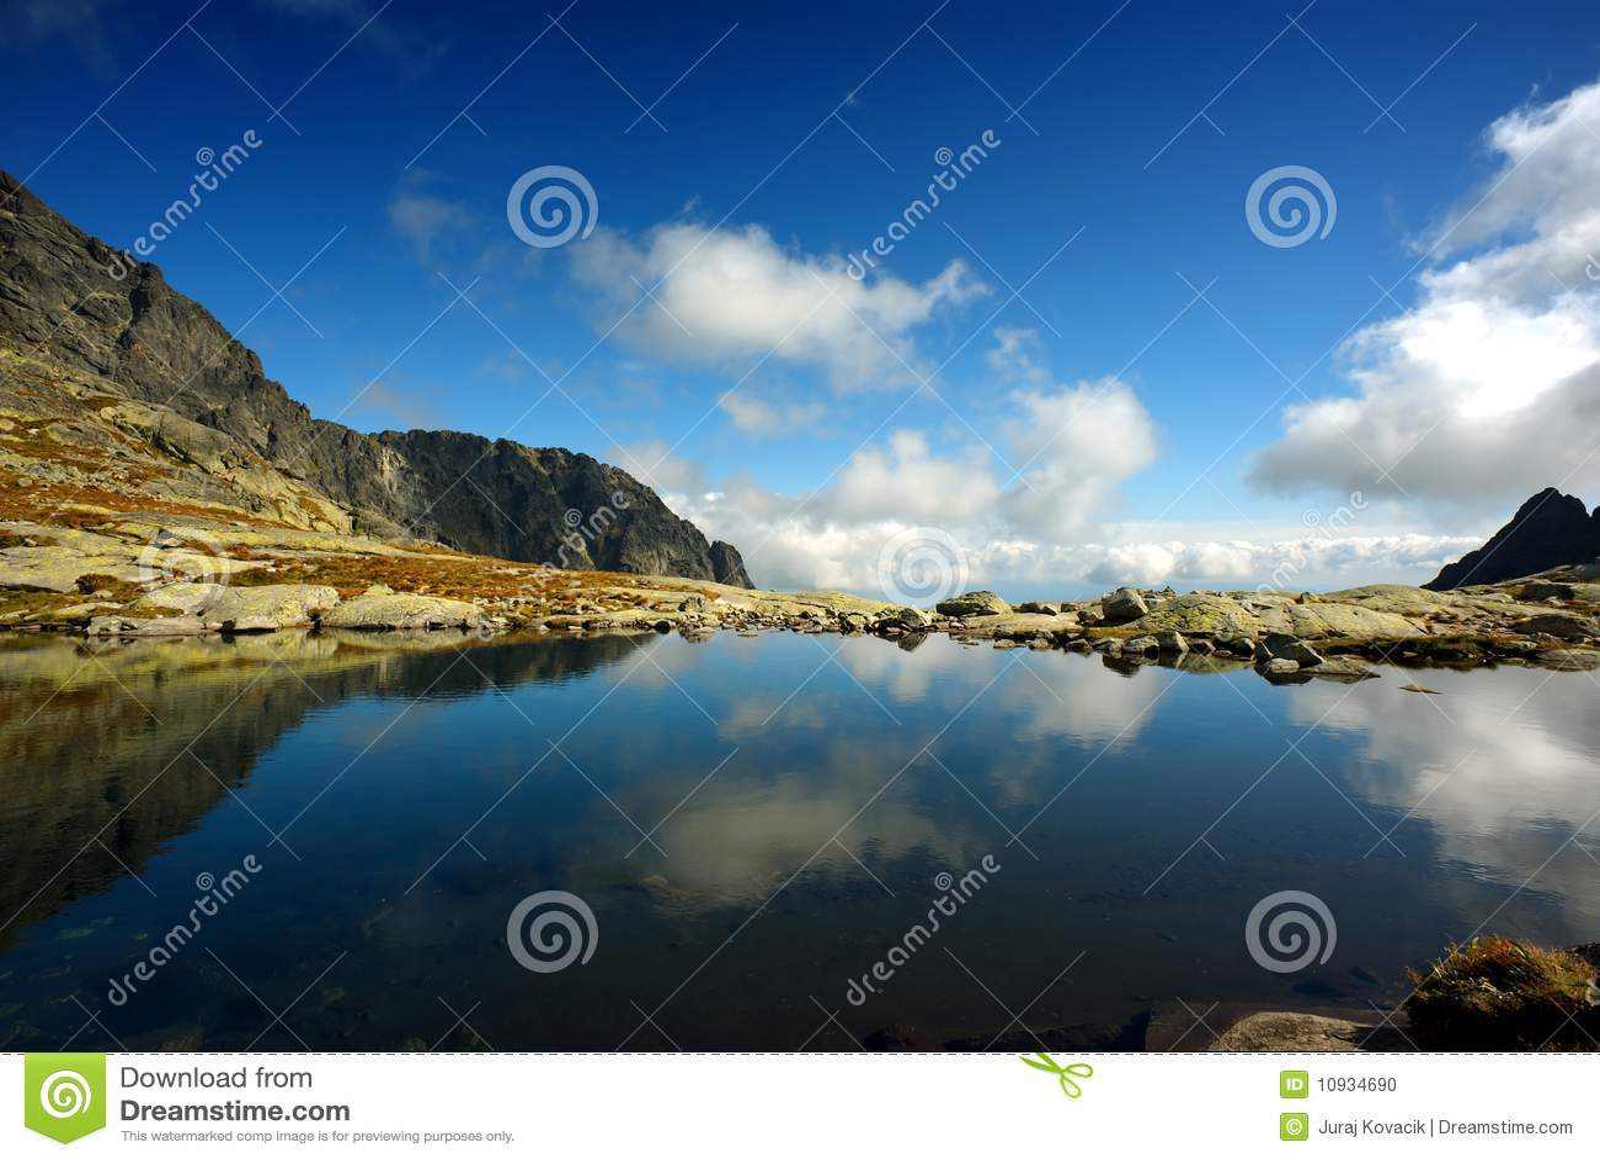 sky blue mountain reflection - photo #13